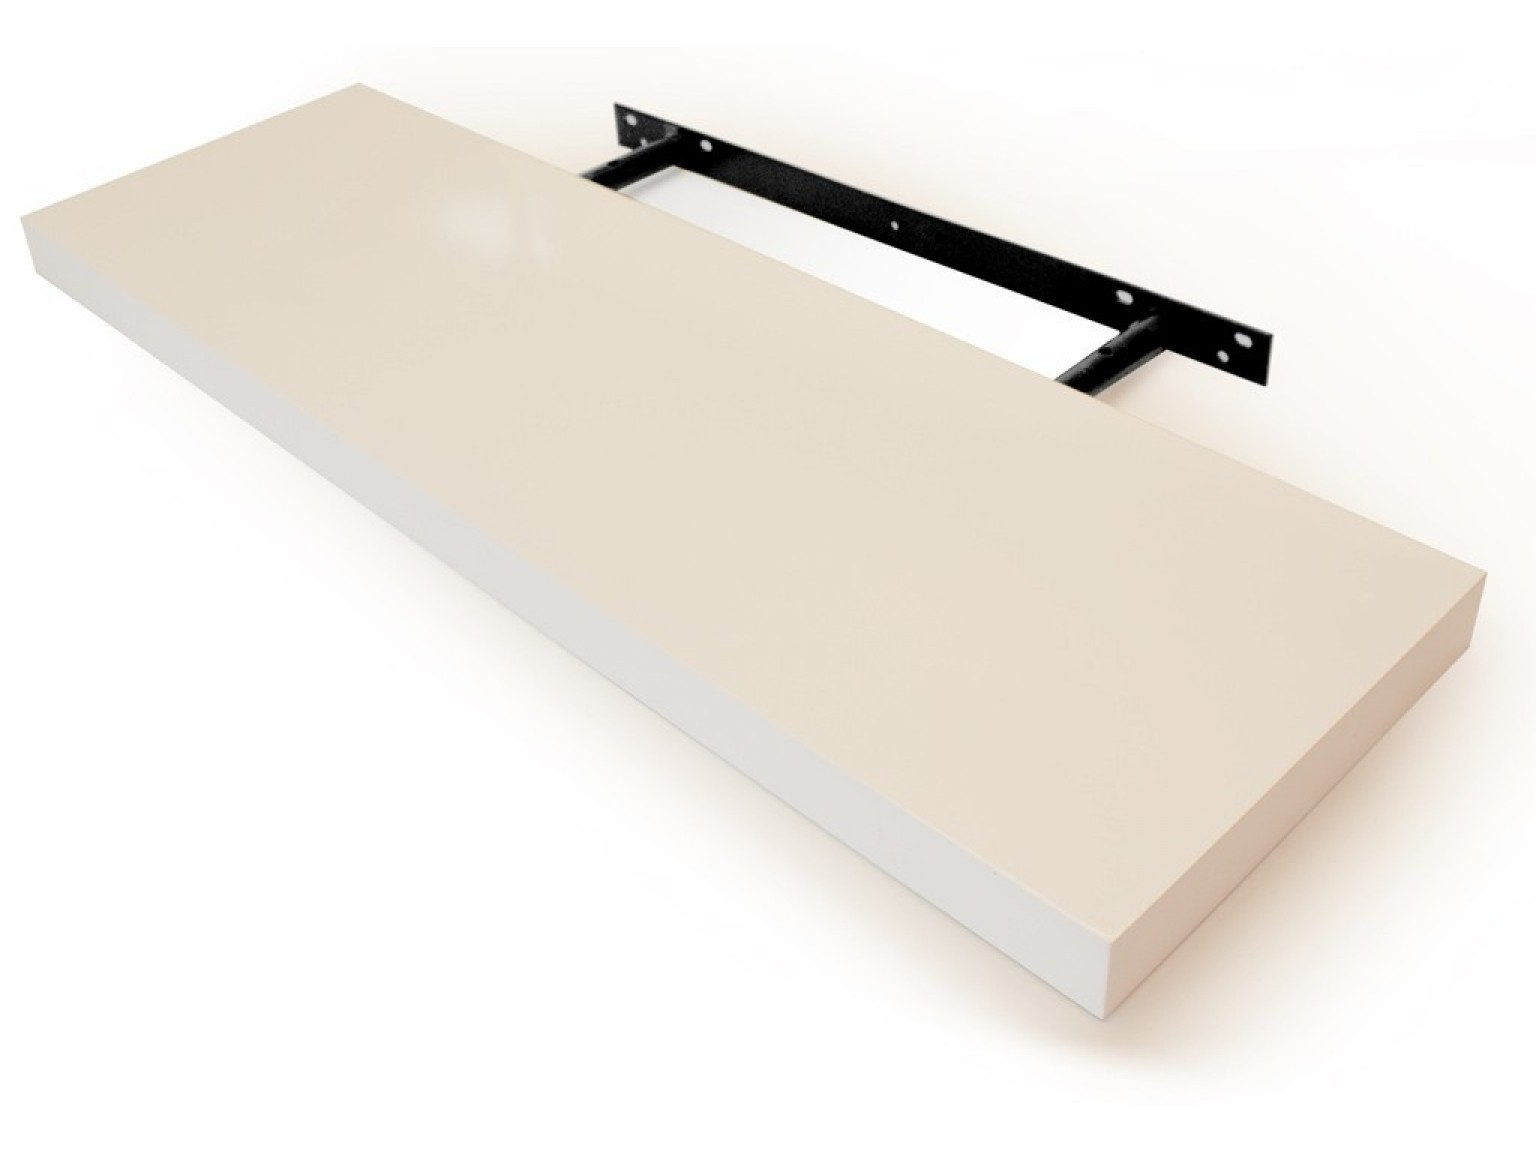 mocka floating shelf storage now brackets perth white wall mounted computer table designs inch shelving unit grey wood shelves shoe holder ornamental iron wide floor organizer